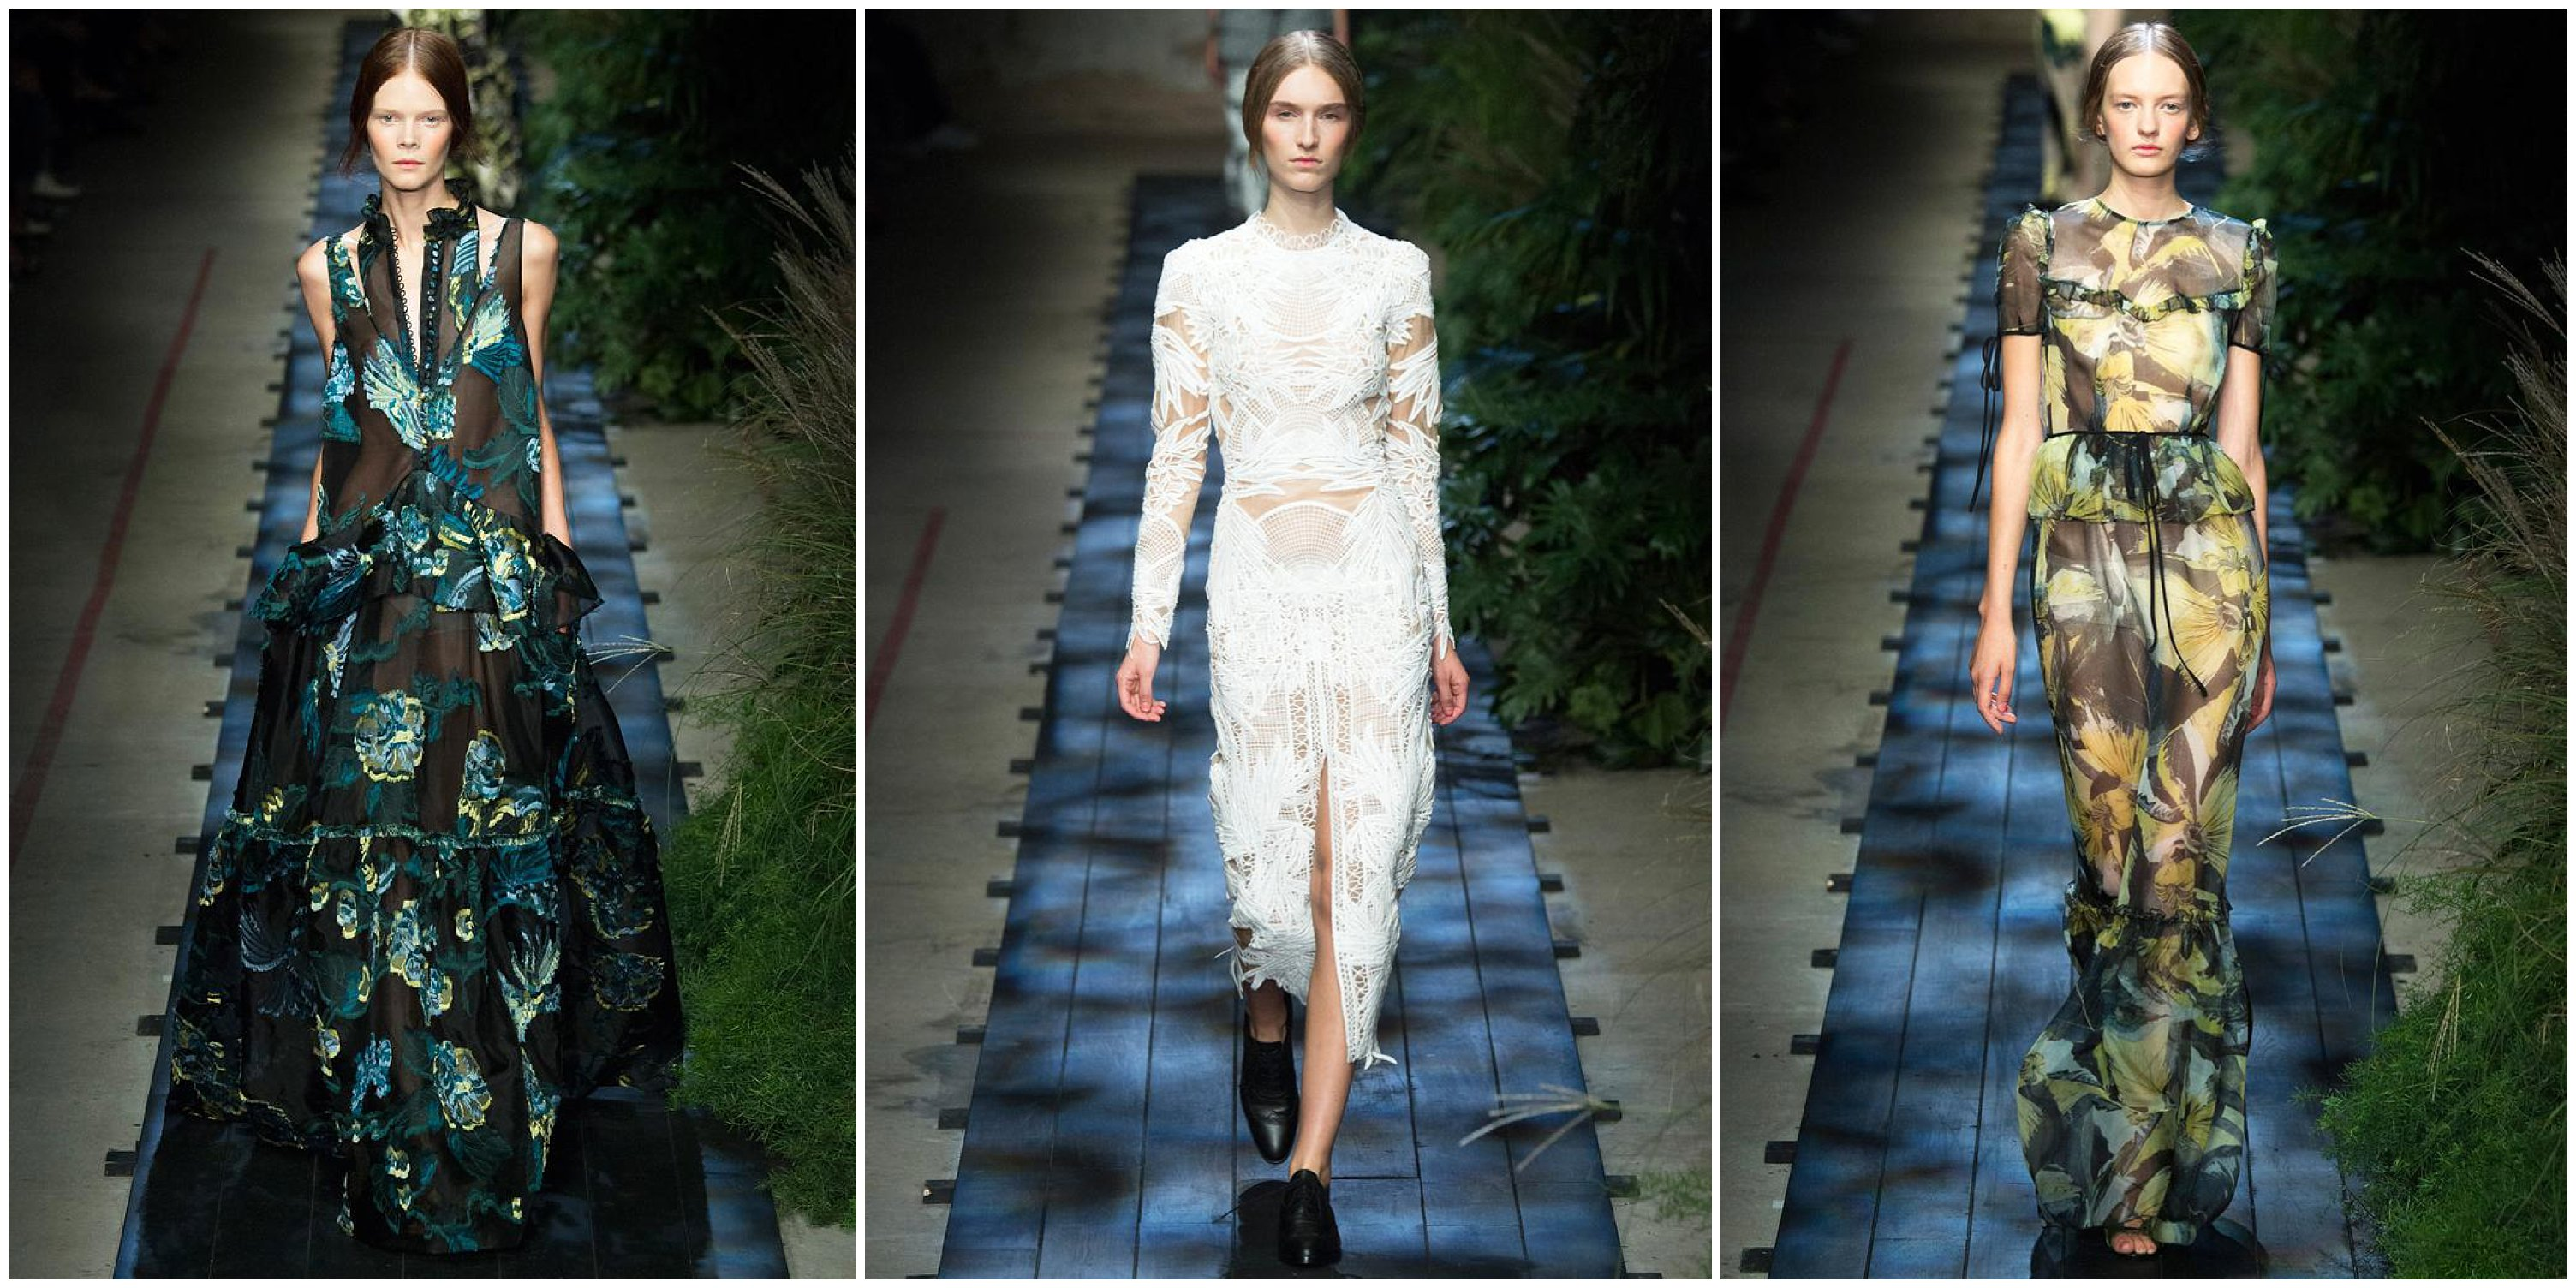 Dress Inspiration: London Fashion Week Sept 14